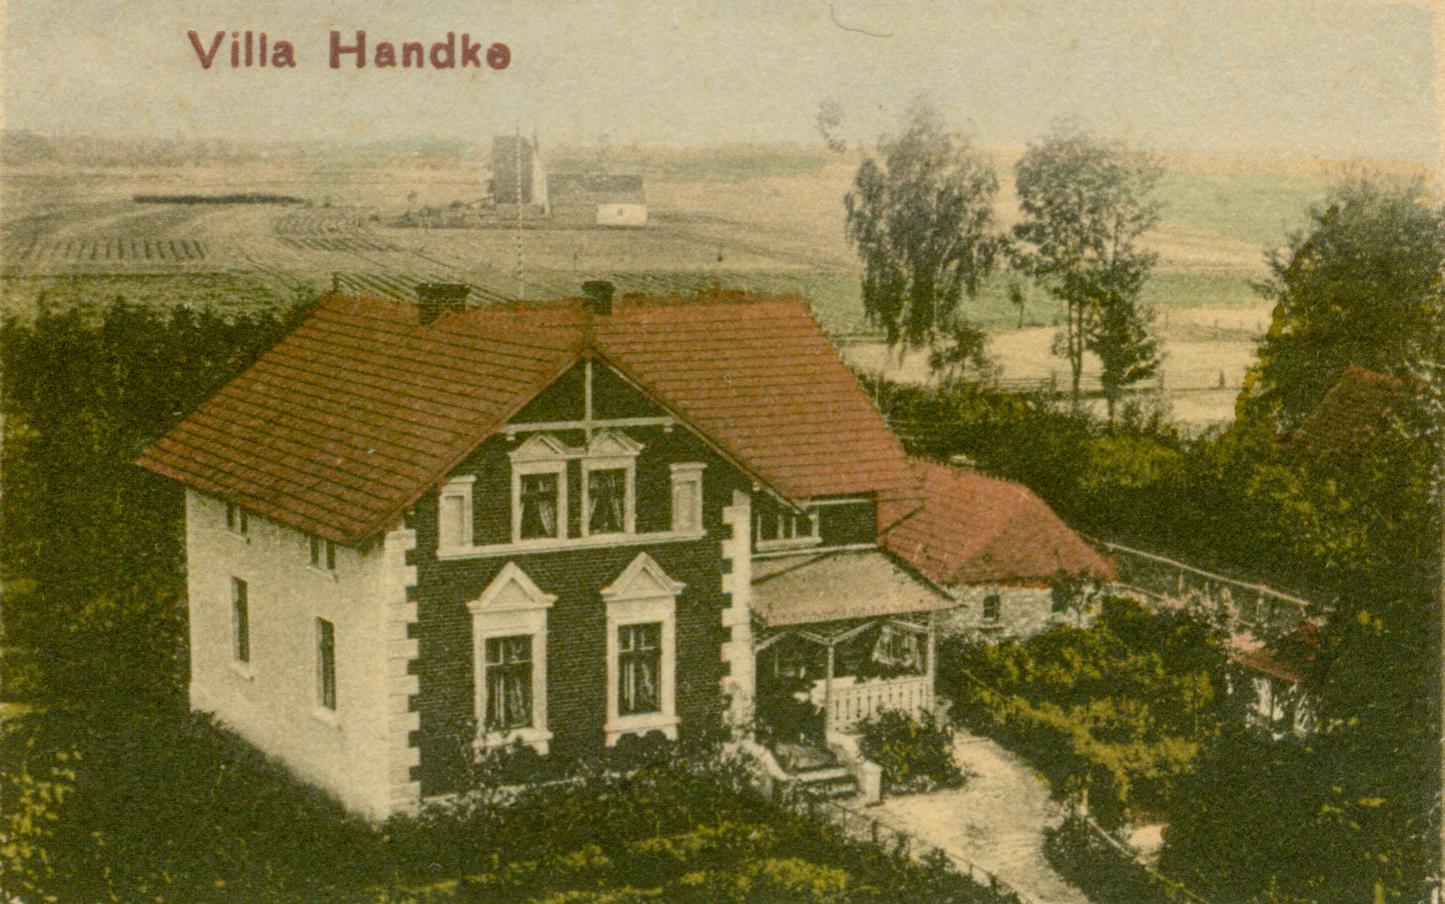 zakecie-willa-handke